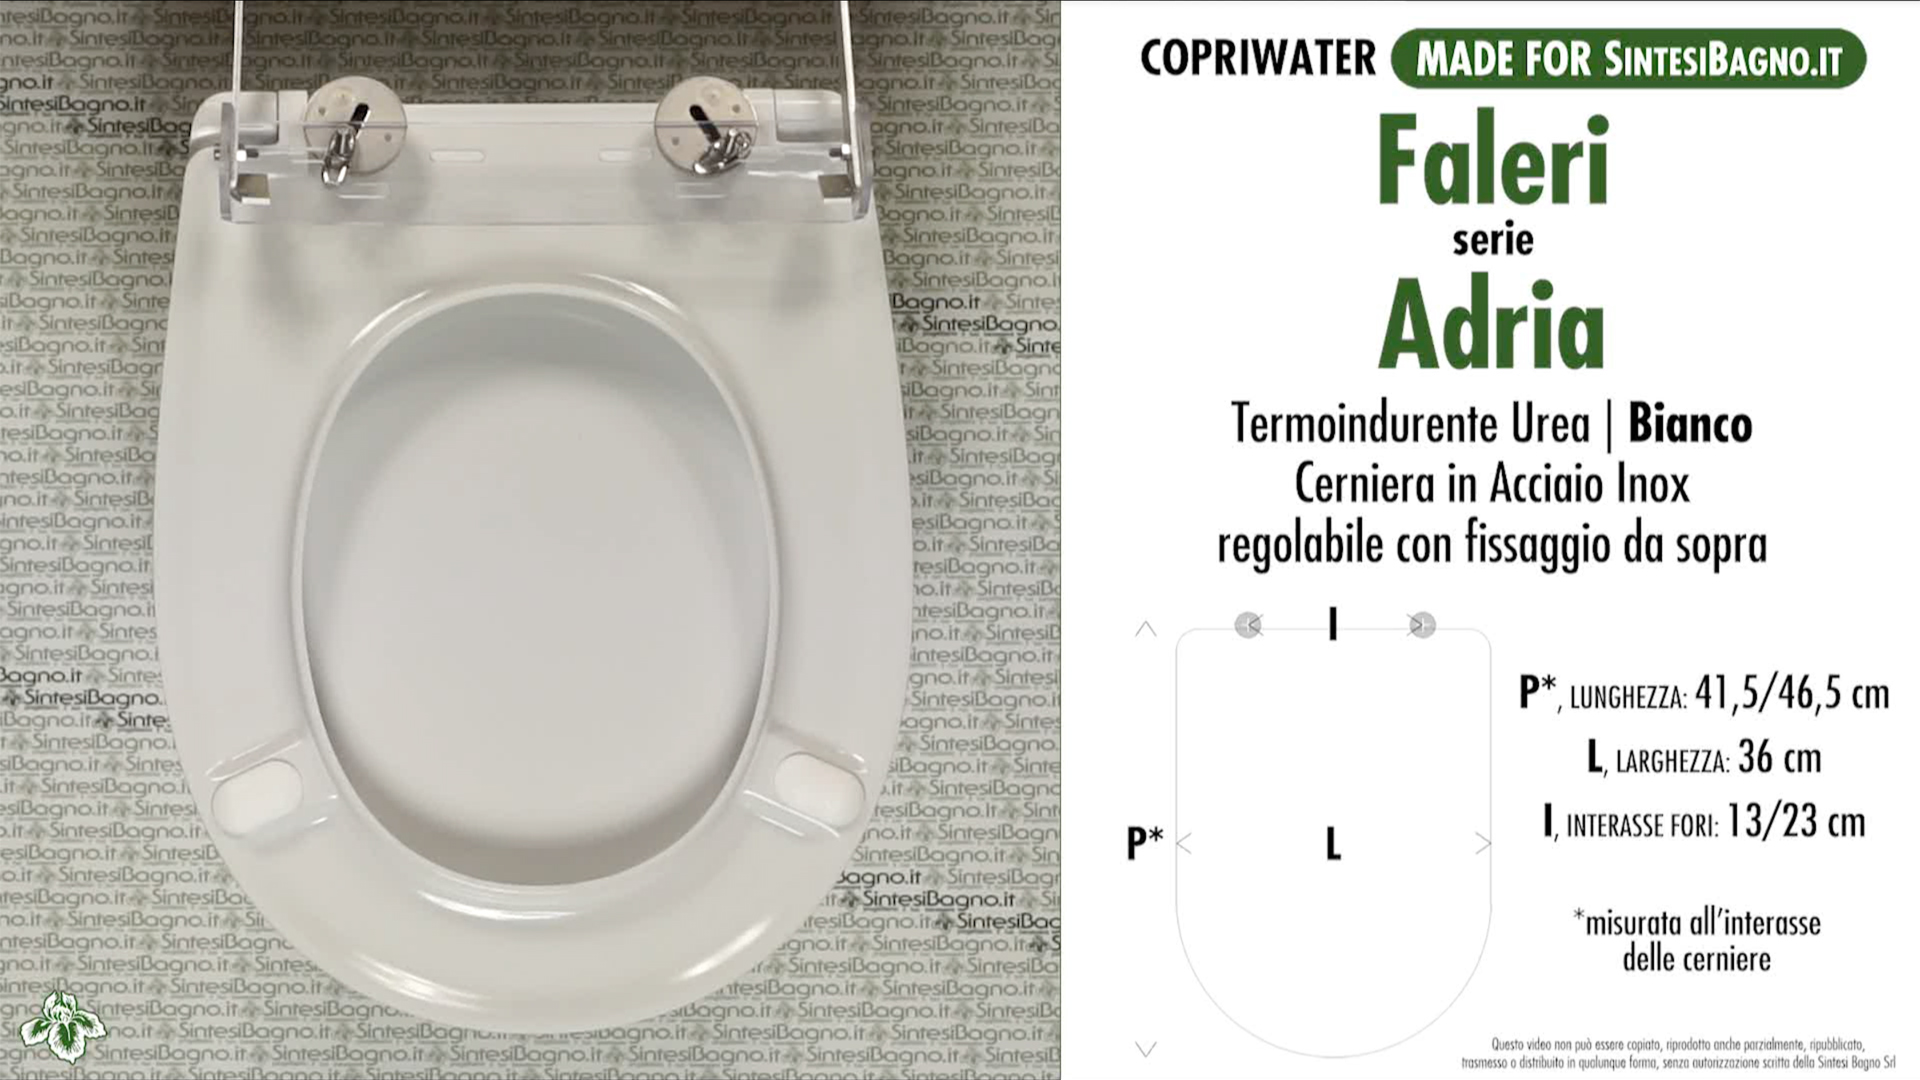 SCHEDA TECNICA MISURE copriwater FALERI ADRIA